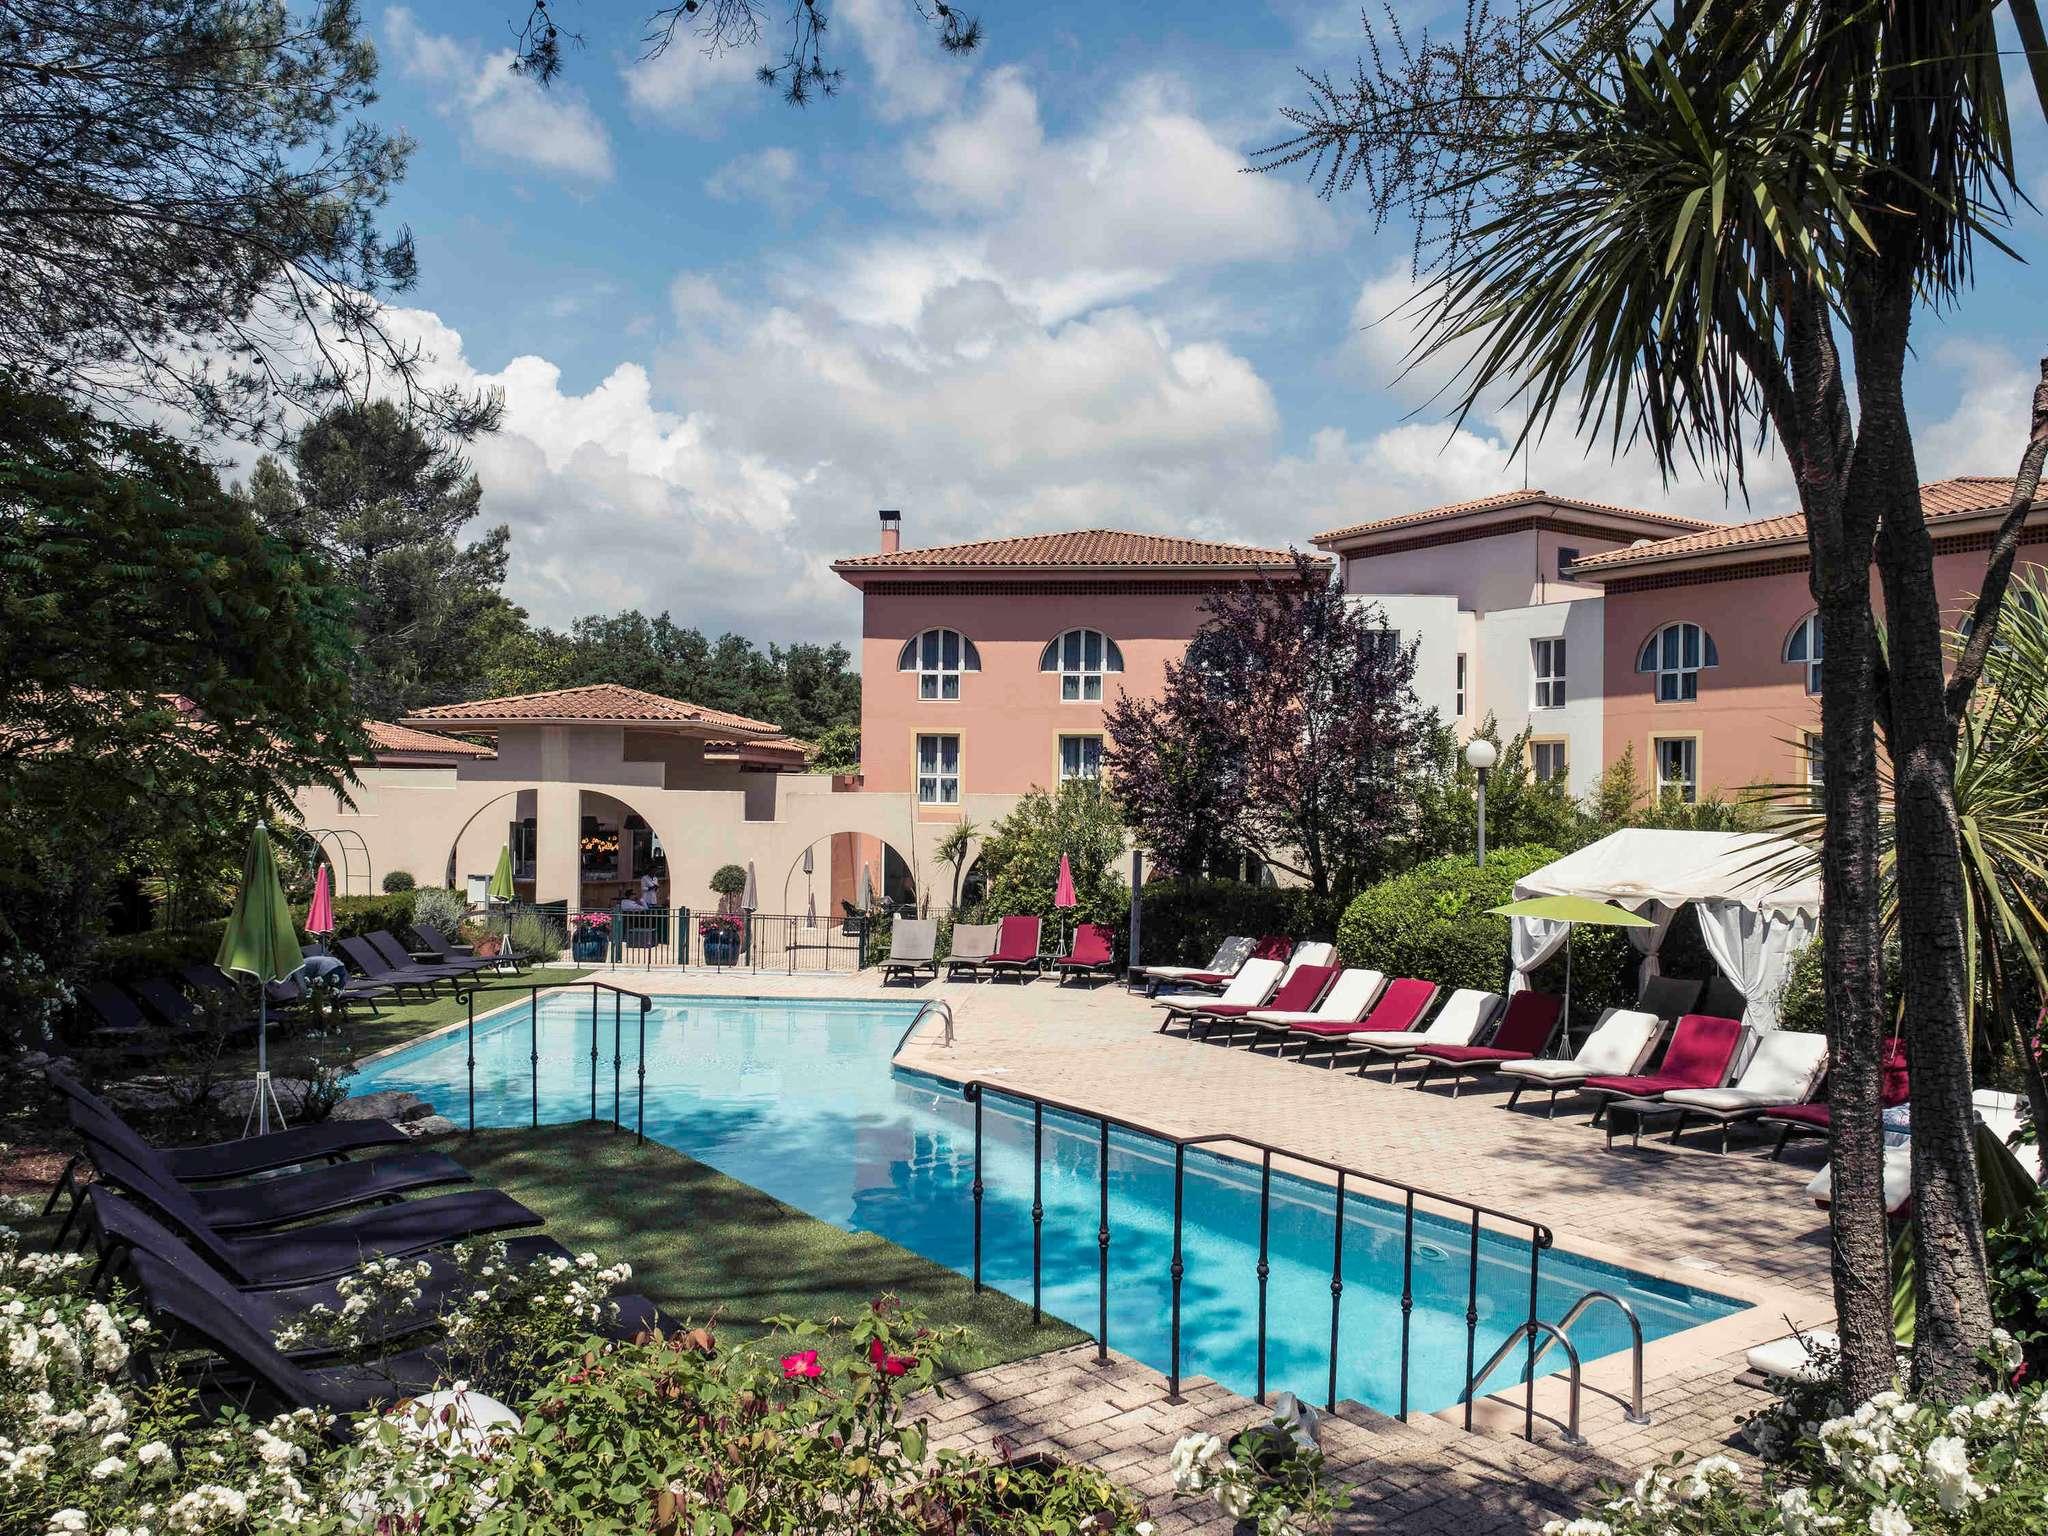 Hotel – Albergo Mercure Antibes Sophia Antipolis